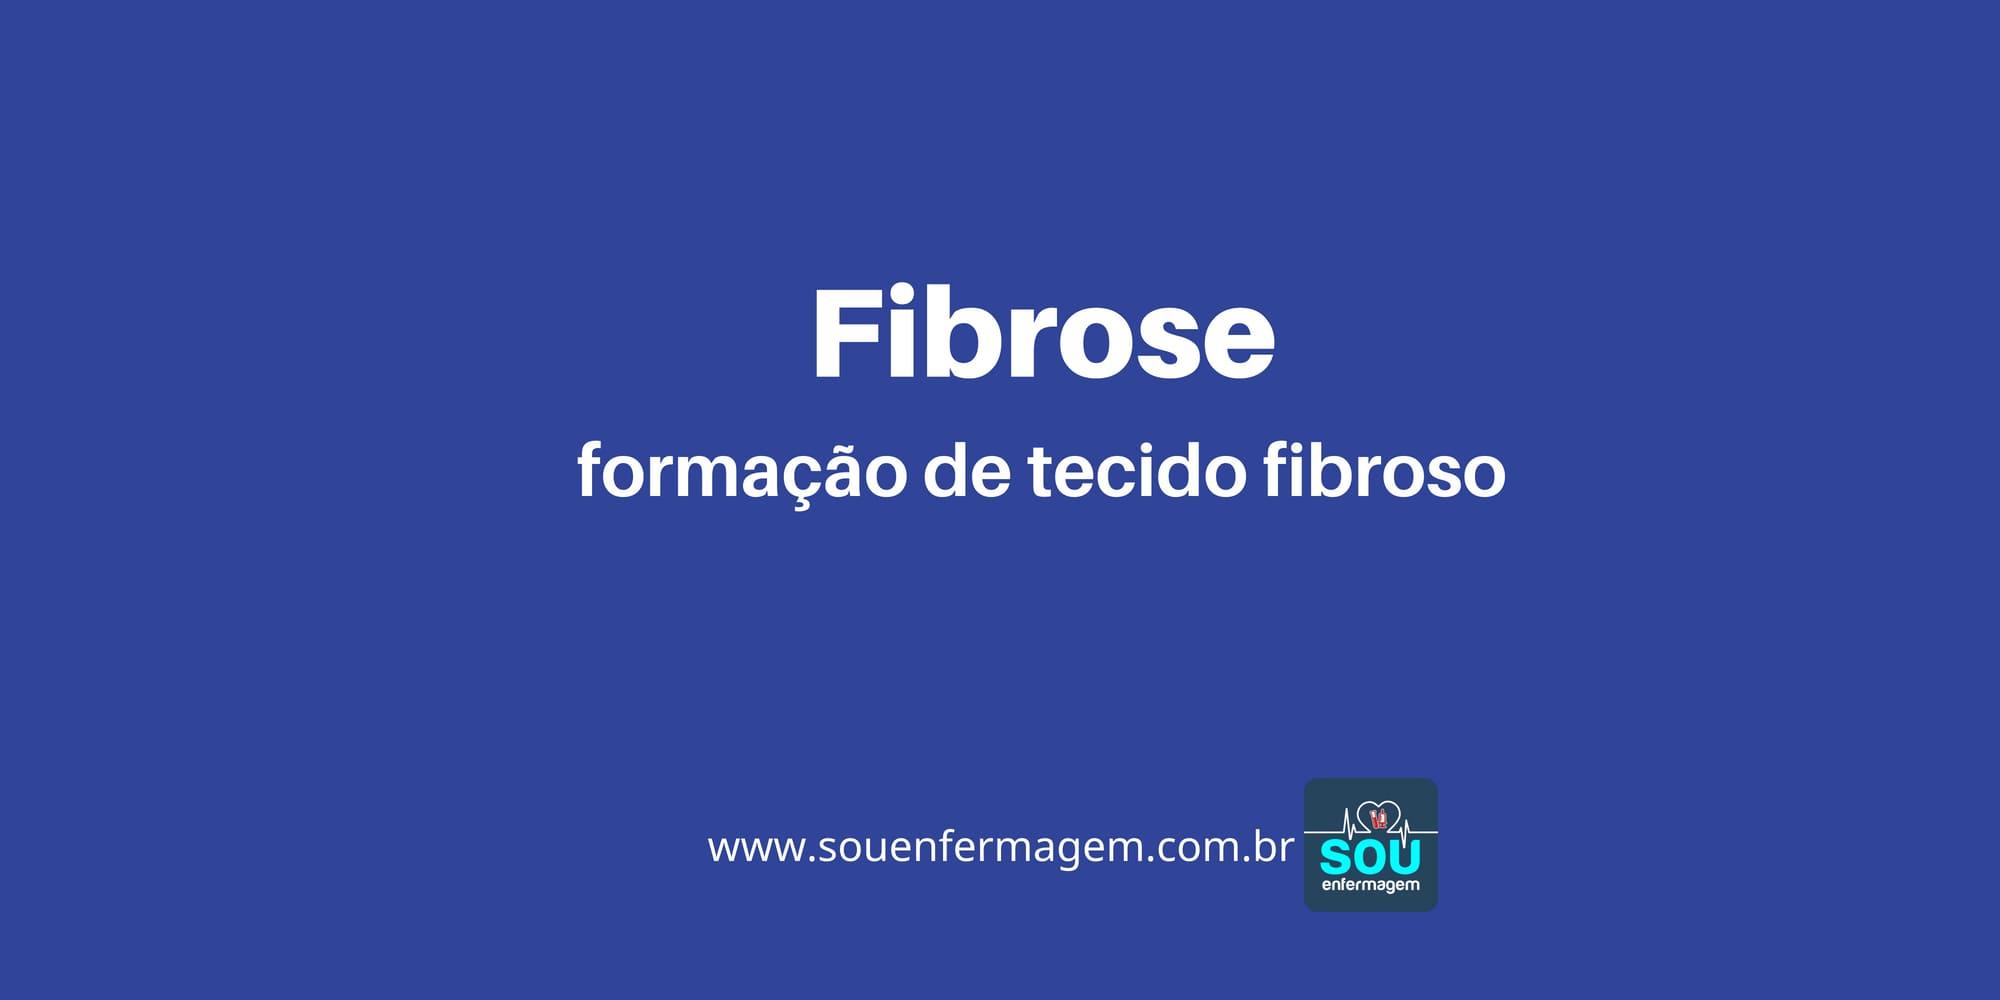 Fibrose.jpg